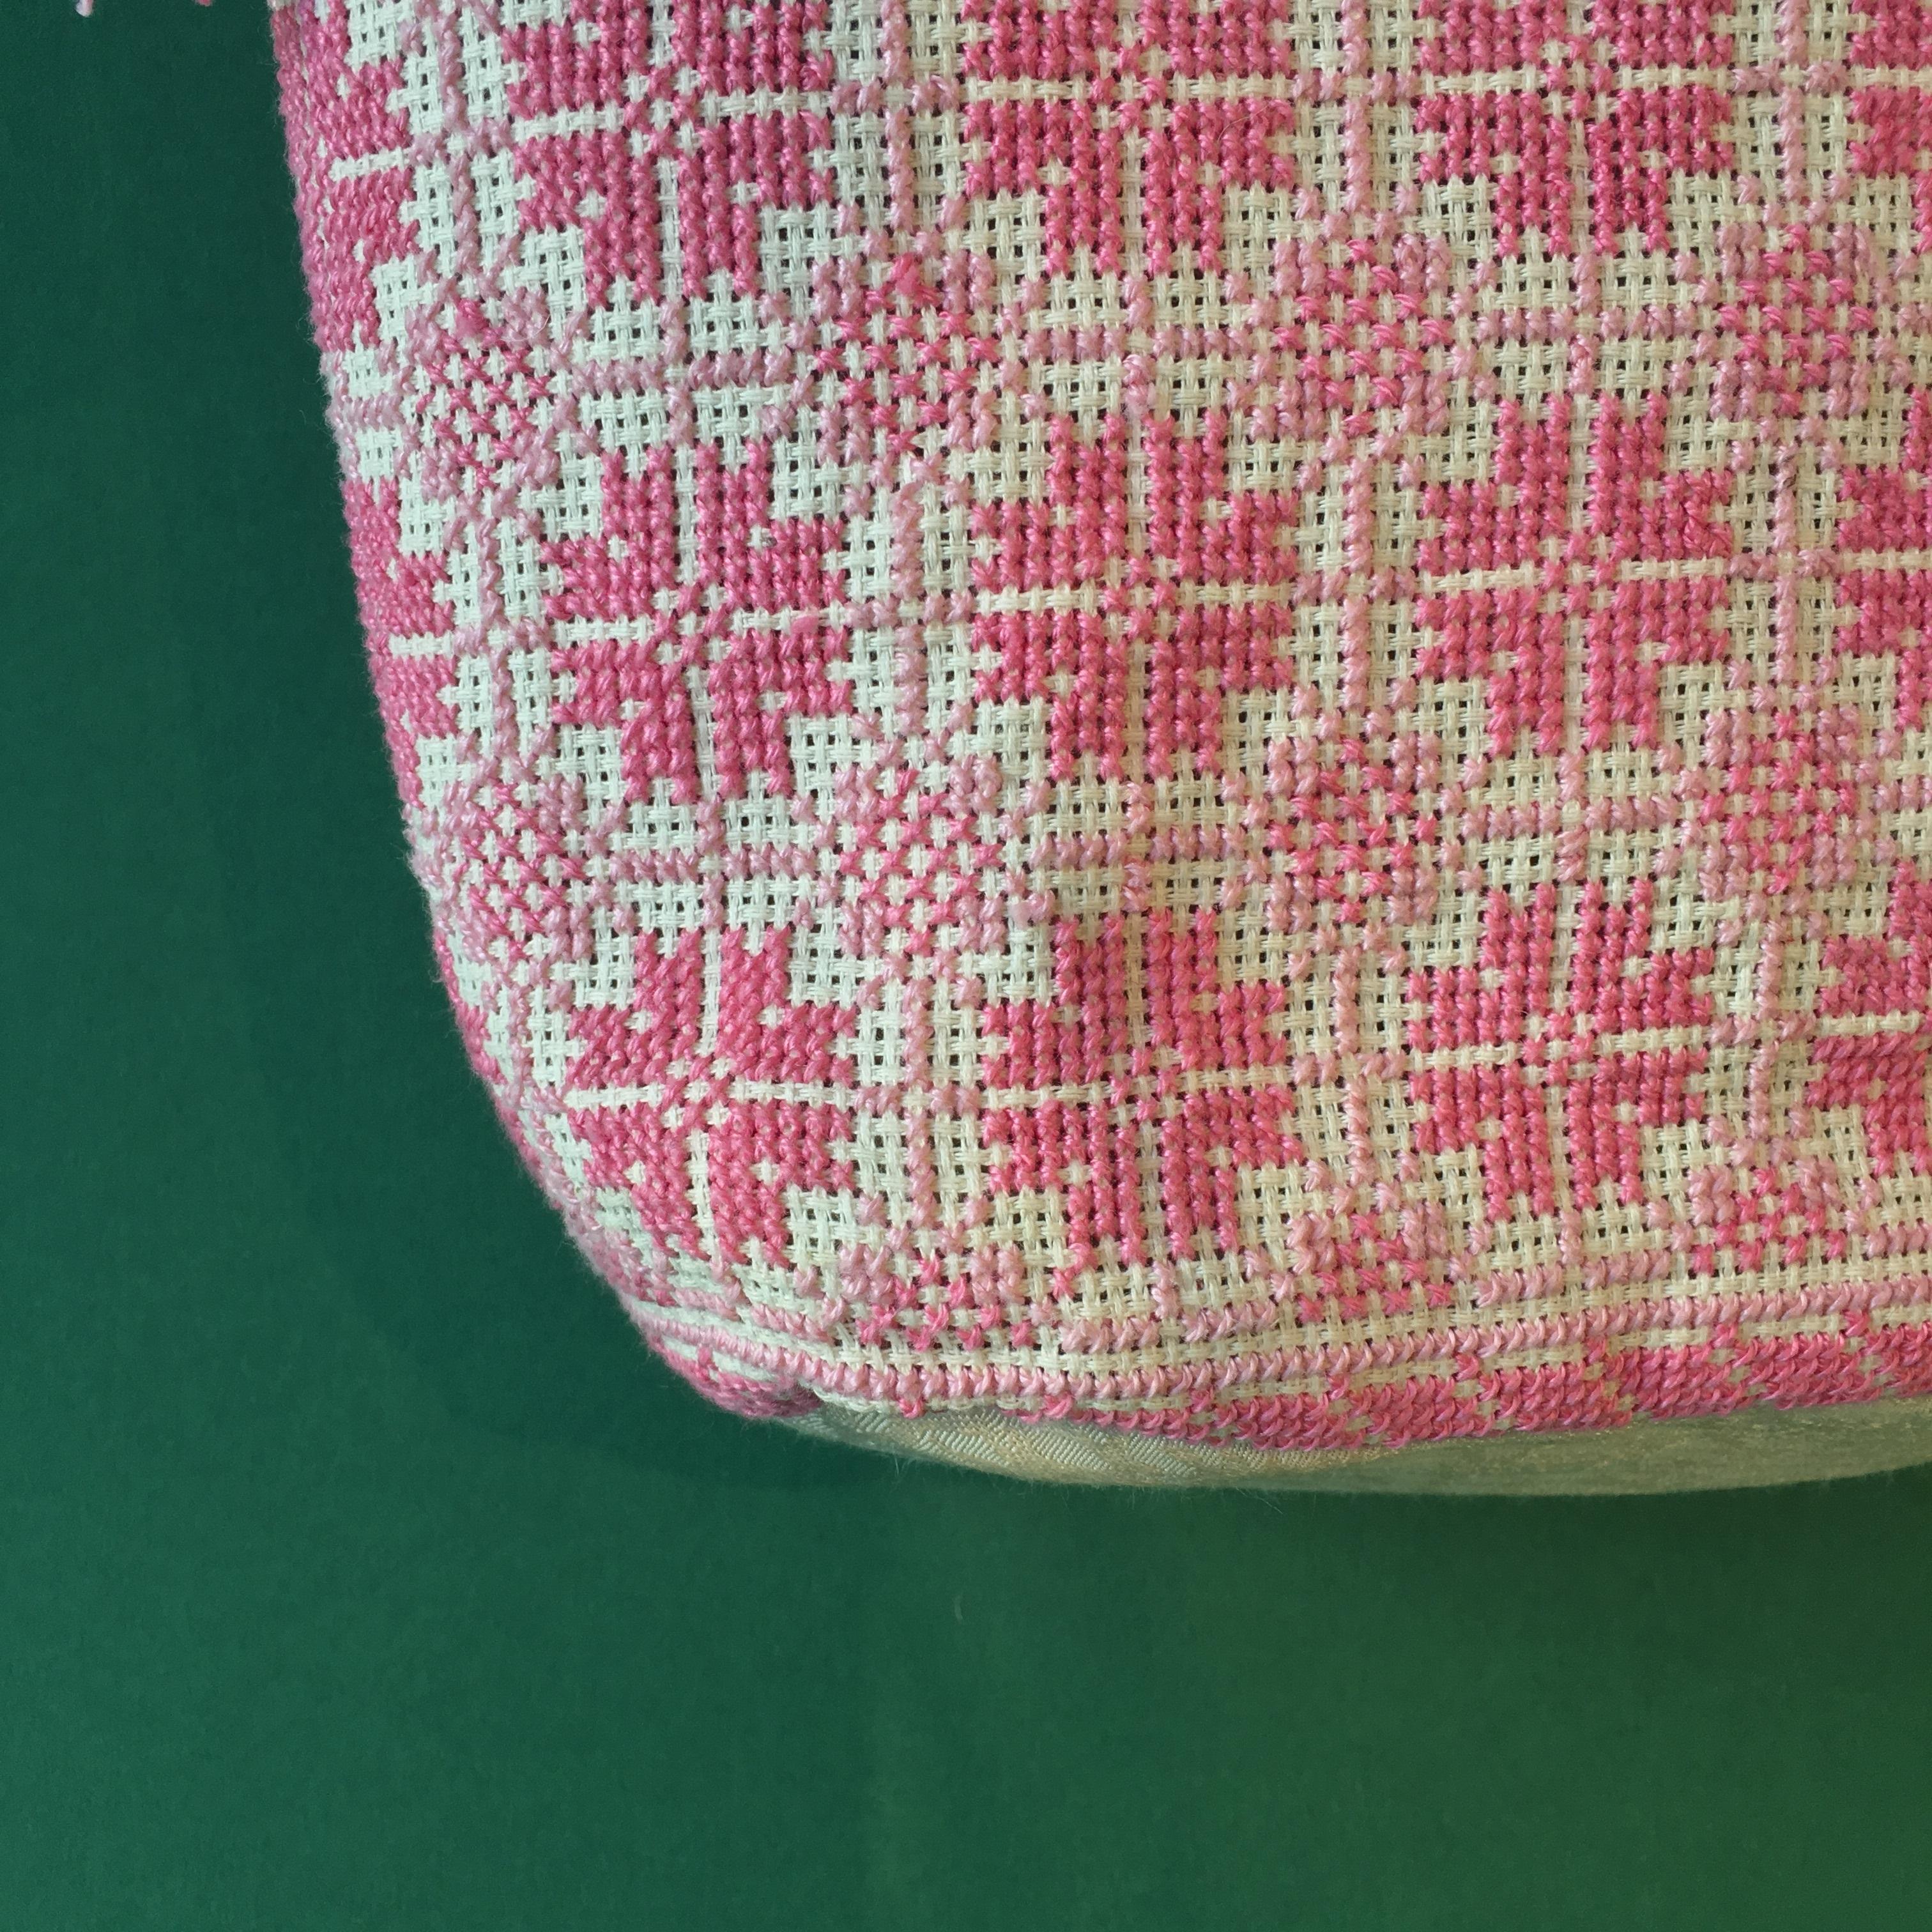 Brodert skulderveske, hvit og rosa